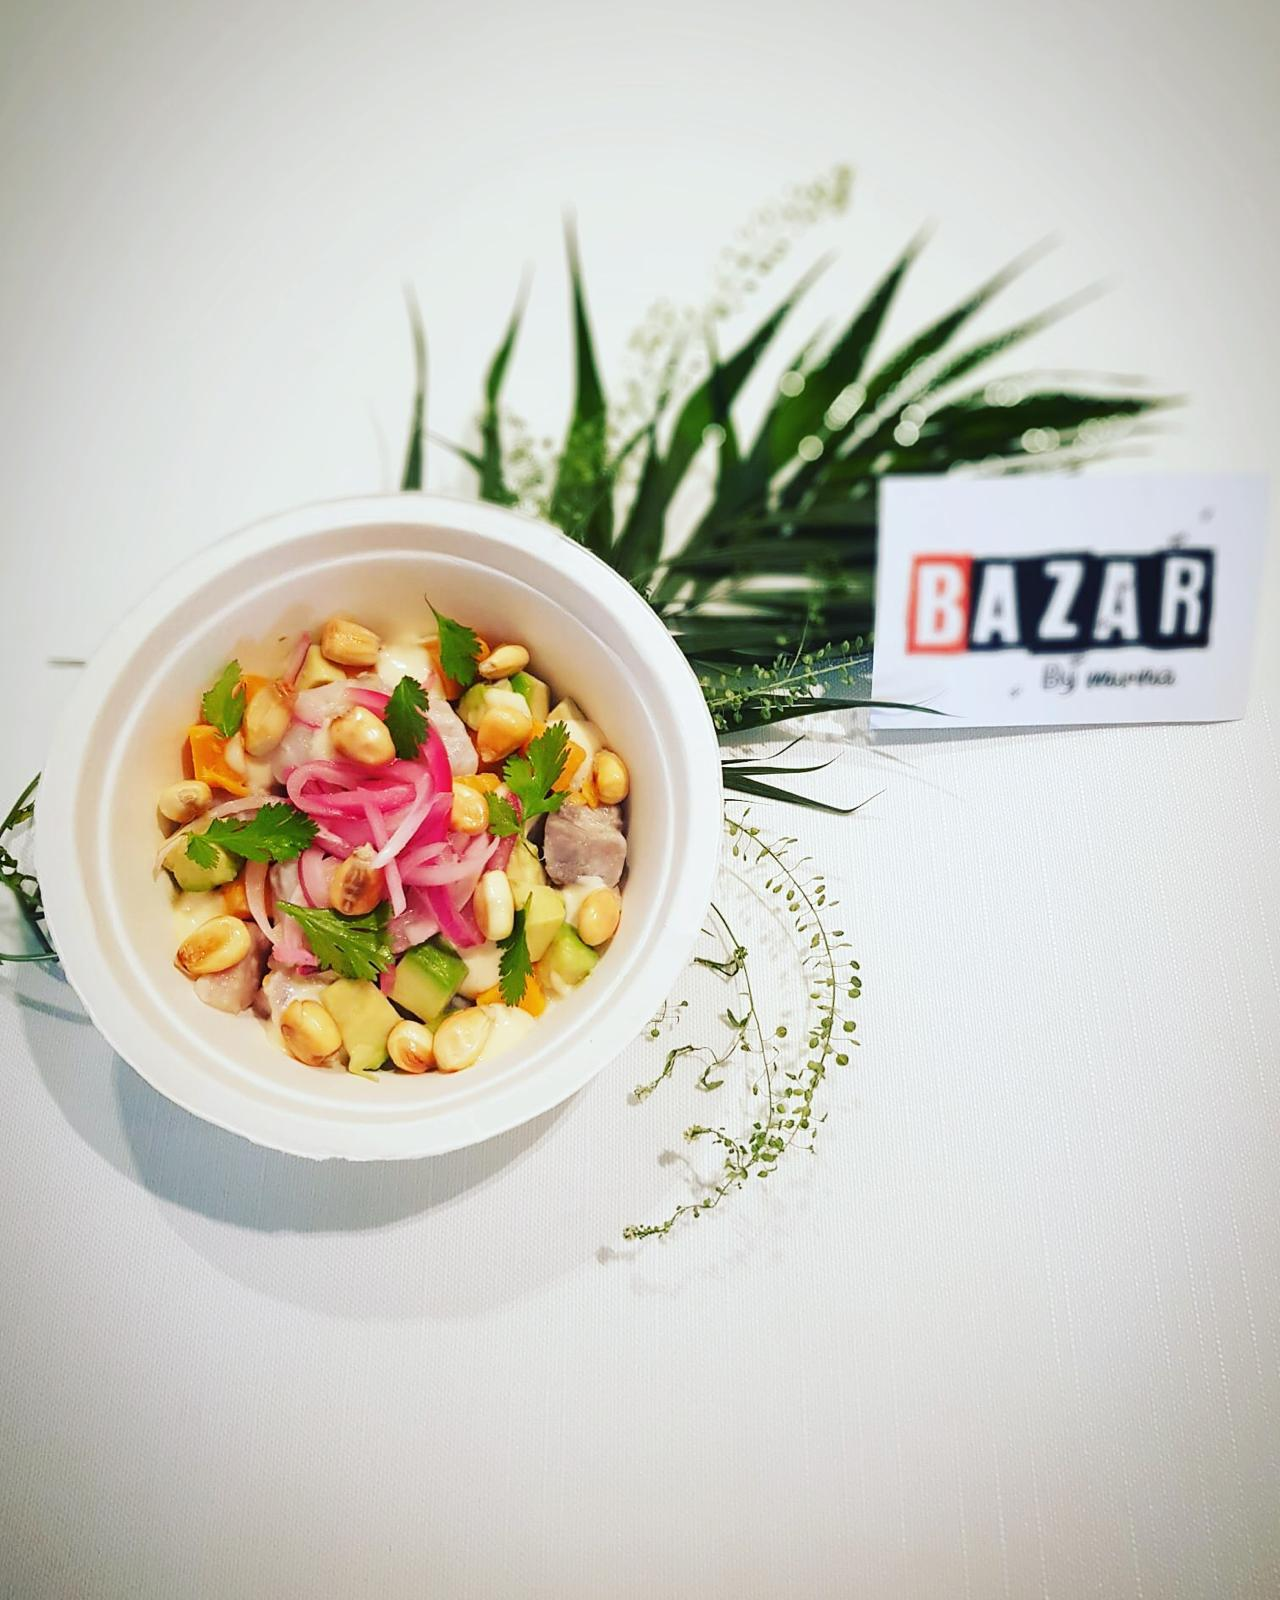 mu-na llega a  tu casa con «BAZAR by mu-na», su propuesta 'canalla' a domicilio 2